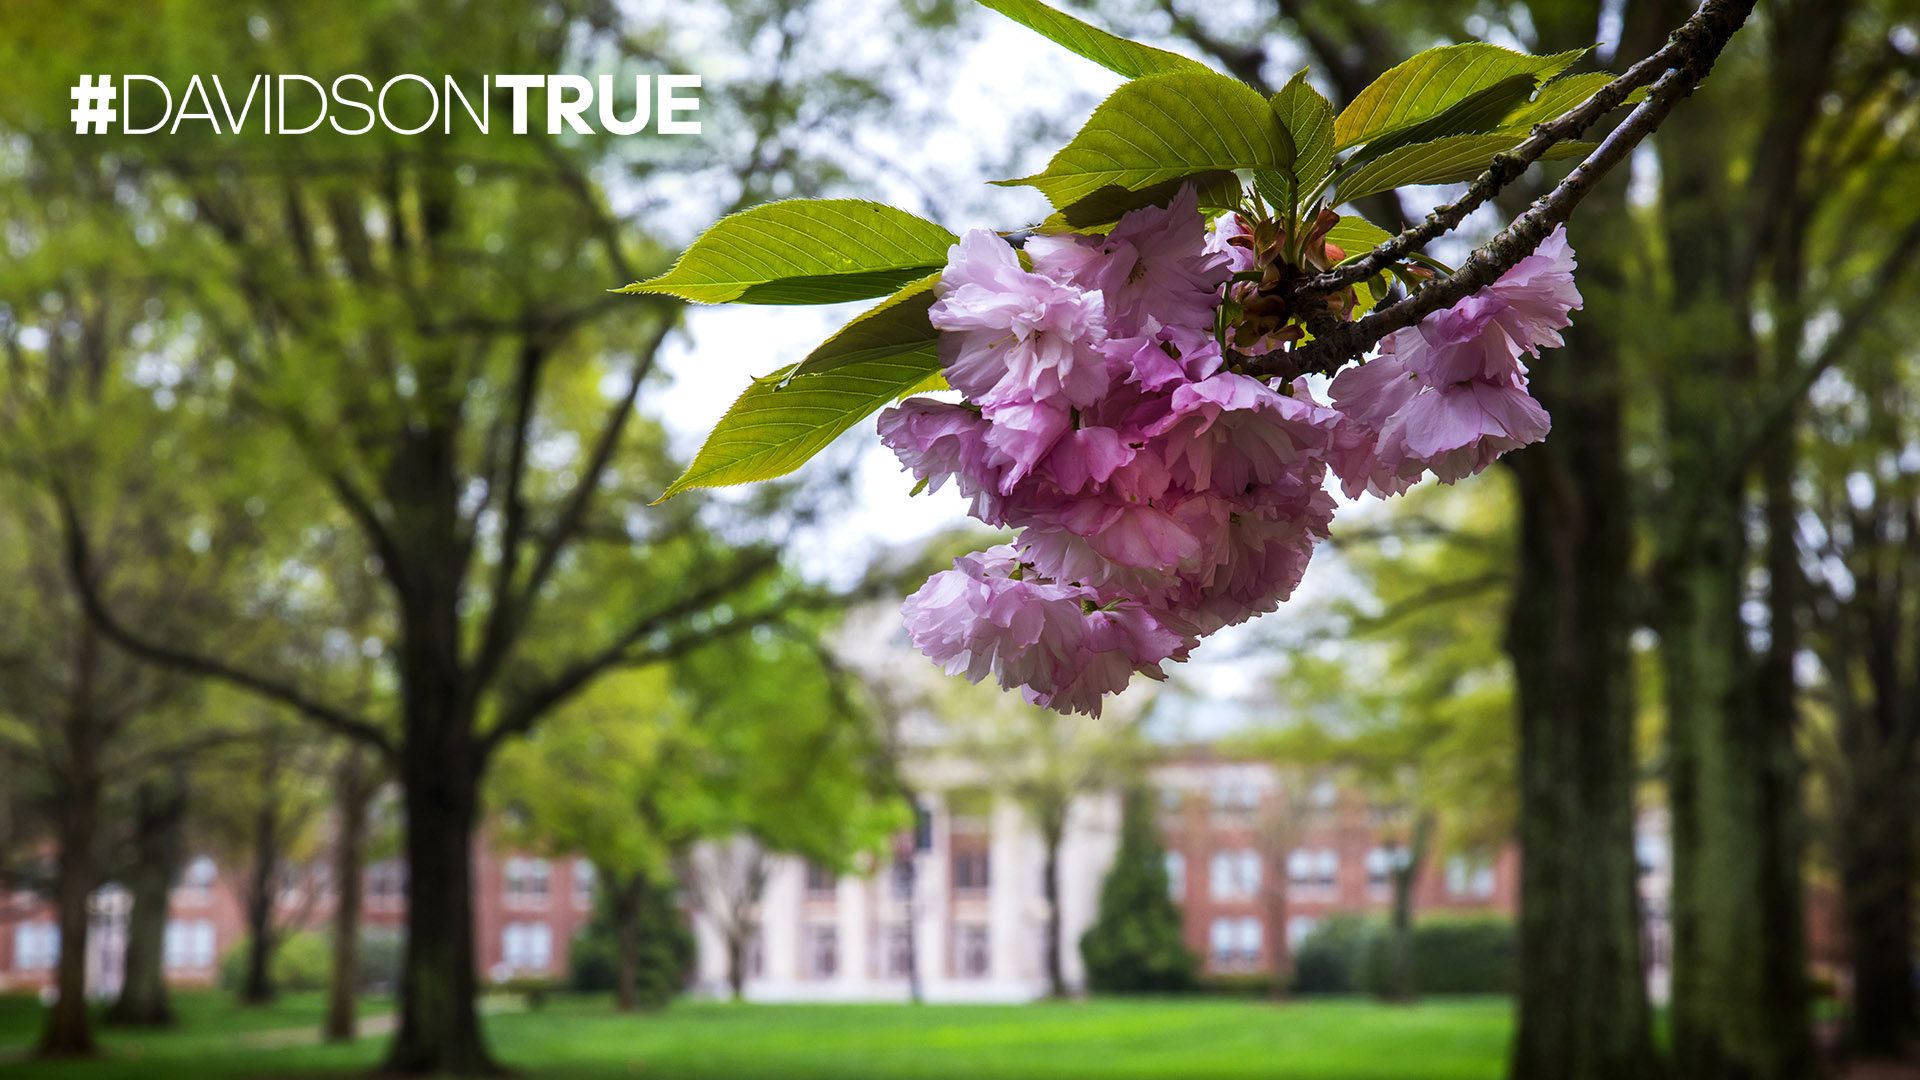 Flowering Tree with #DAVIDSONTRUE